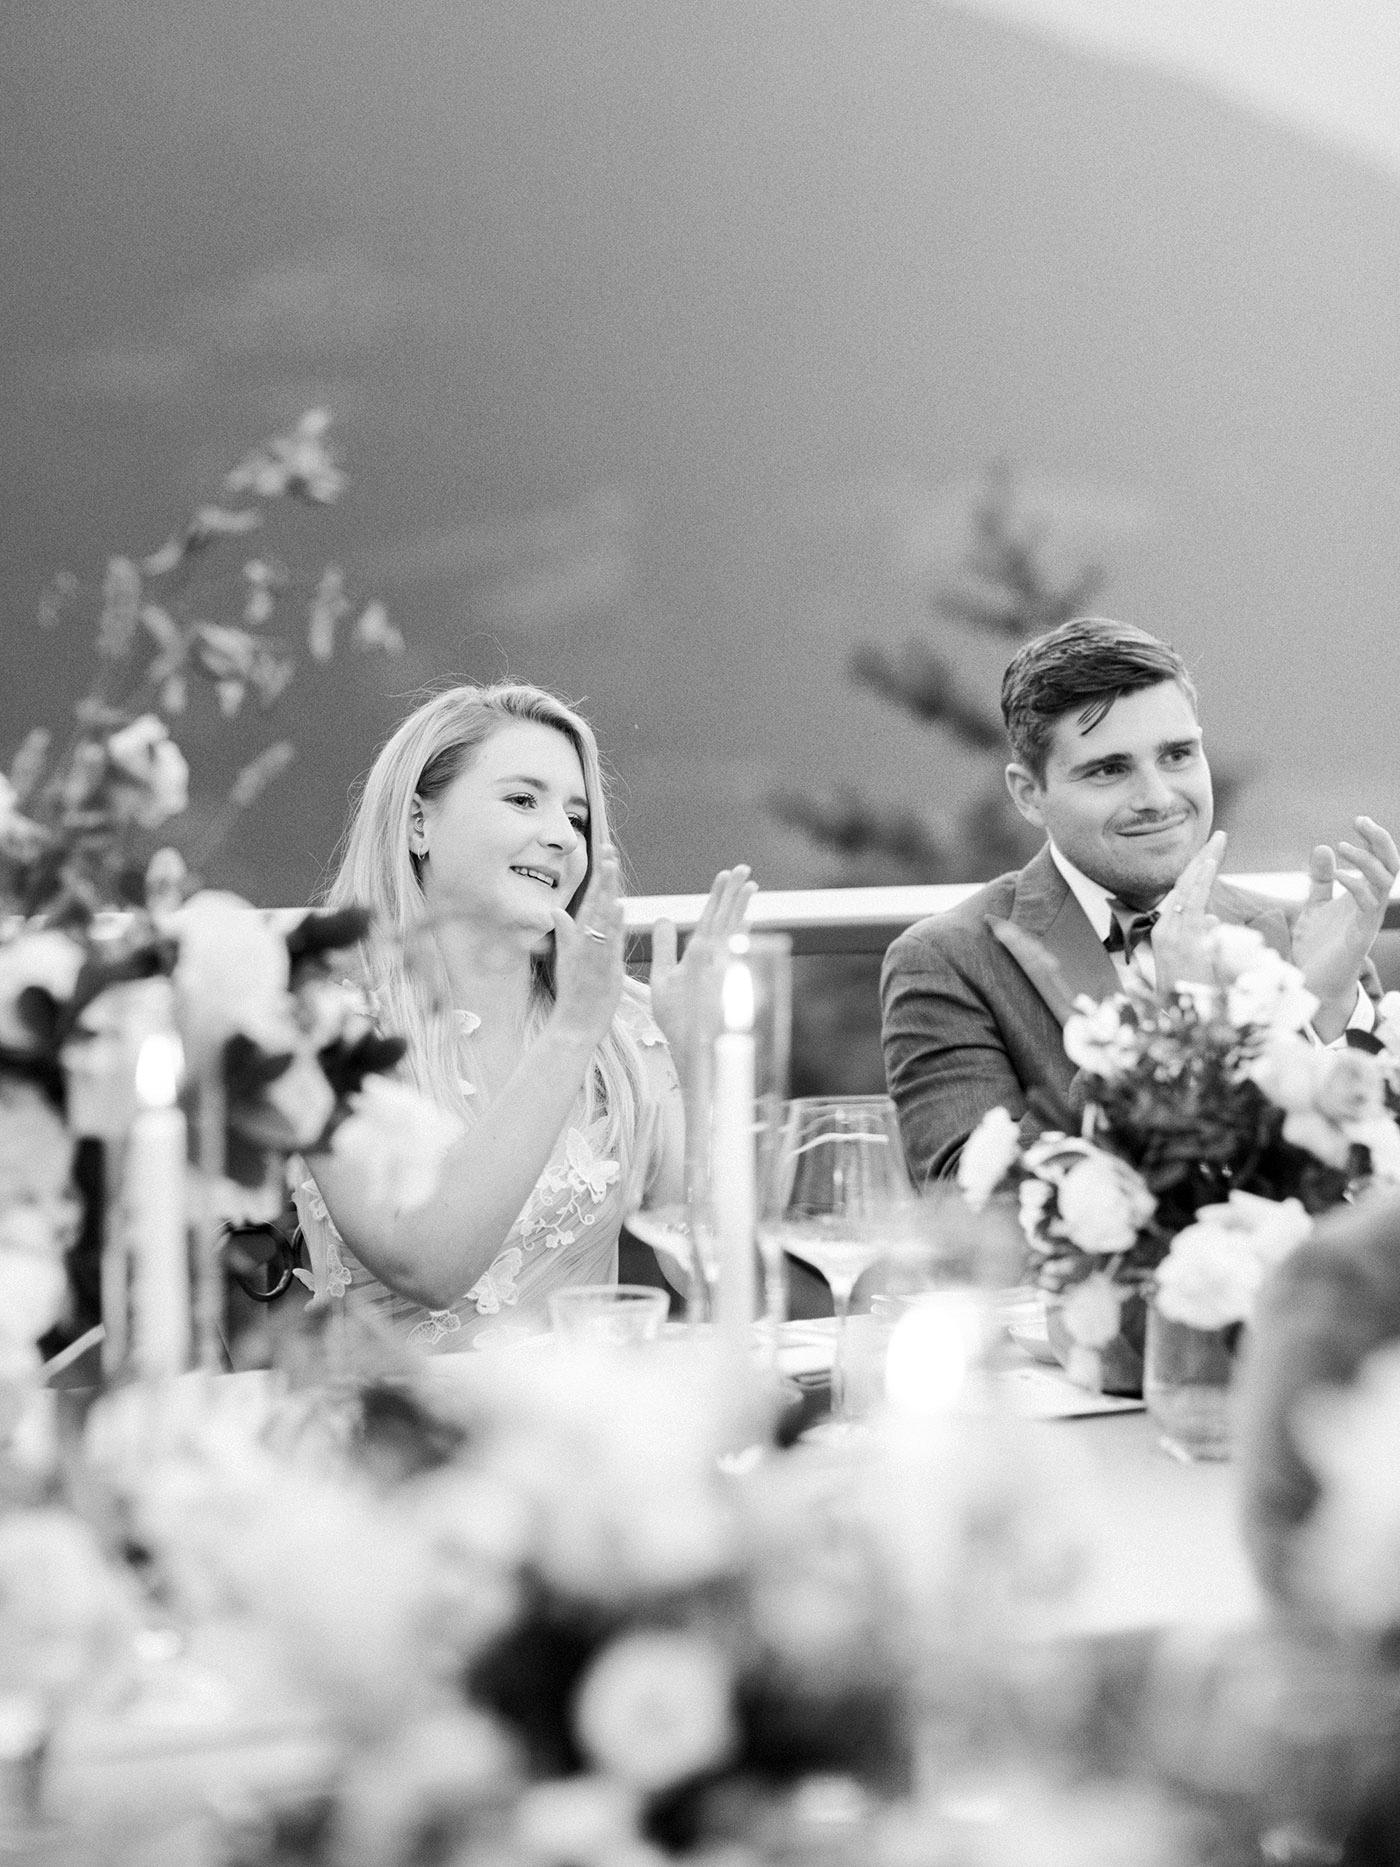 julia franz wedding speeches bride and groom